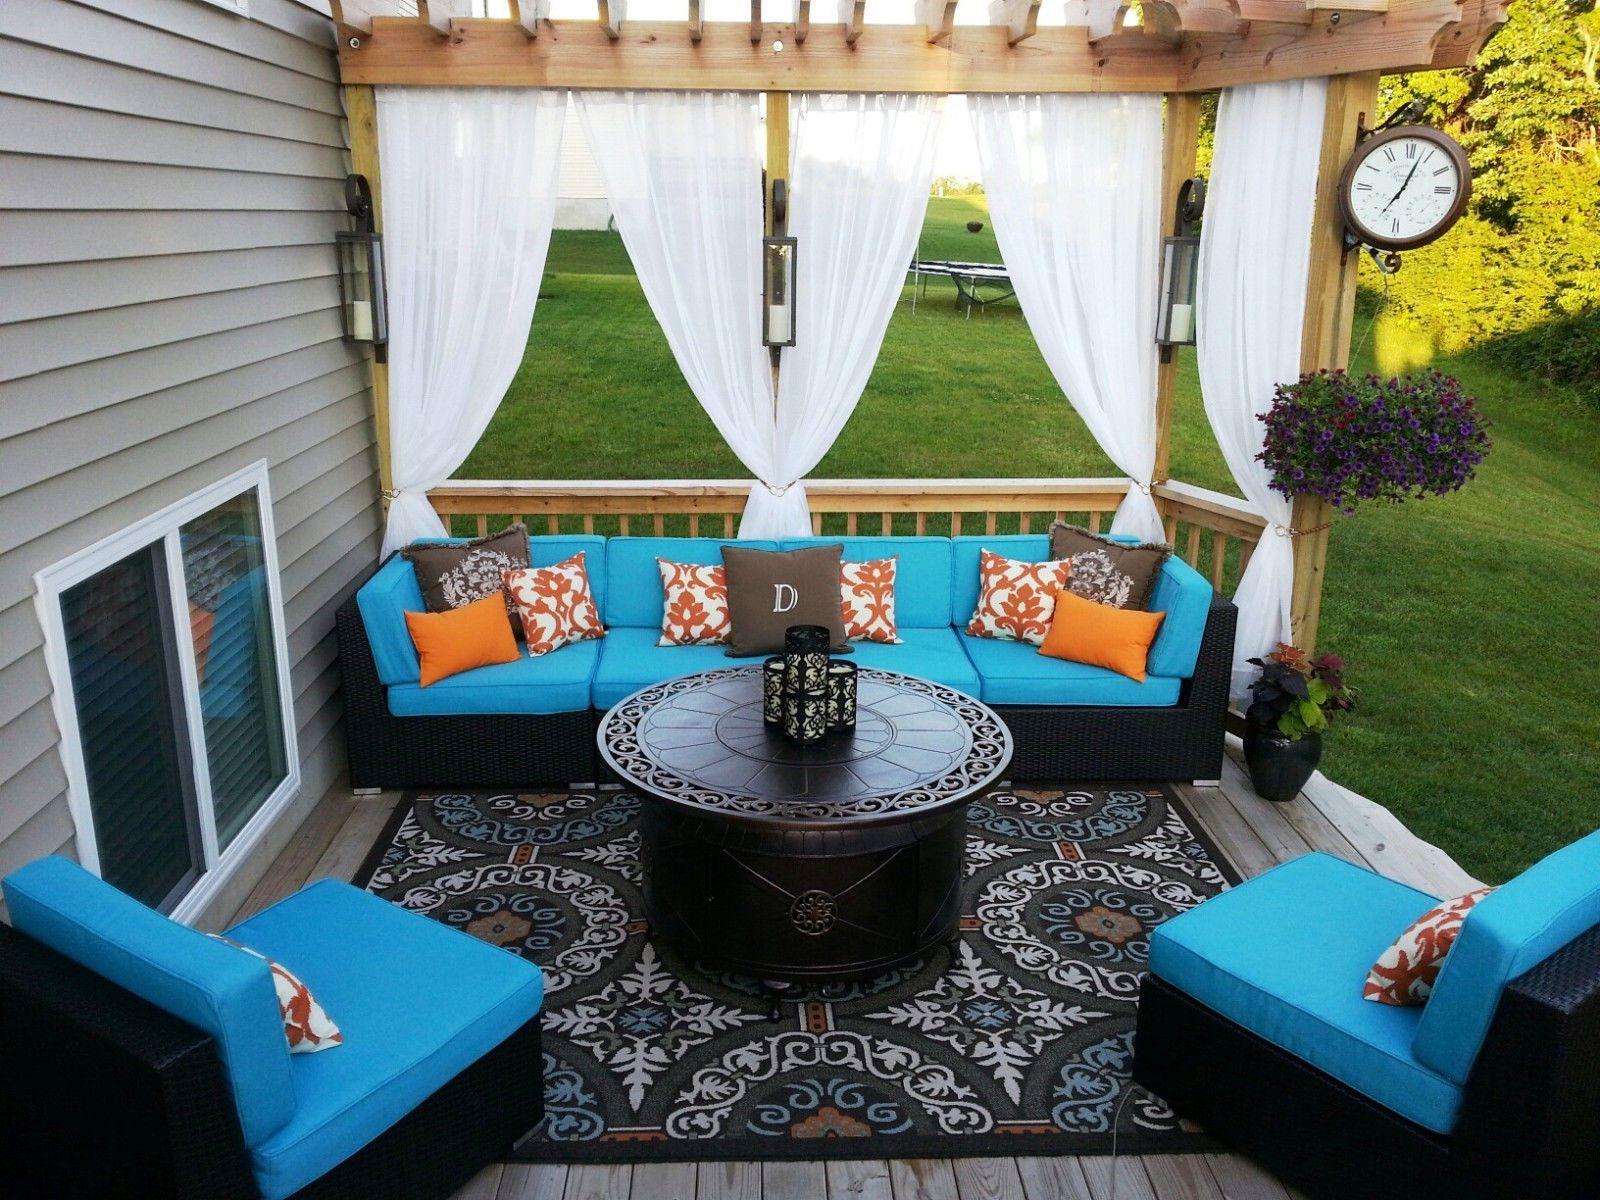 1 OUTDOOR Gazebo Patio Sheer Velcro Tab Top Window Panel Garden Curtain  Drapes | EBay